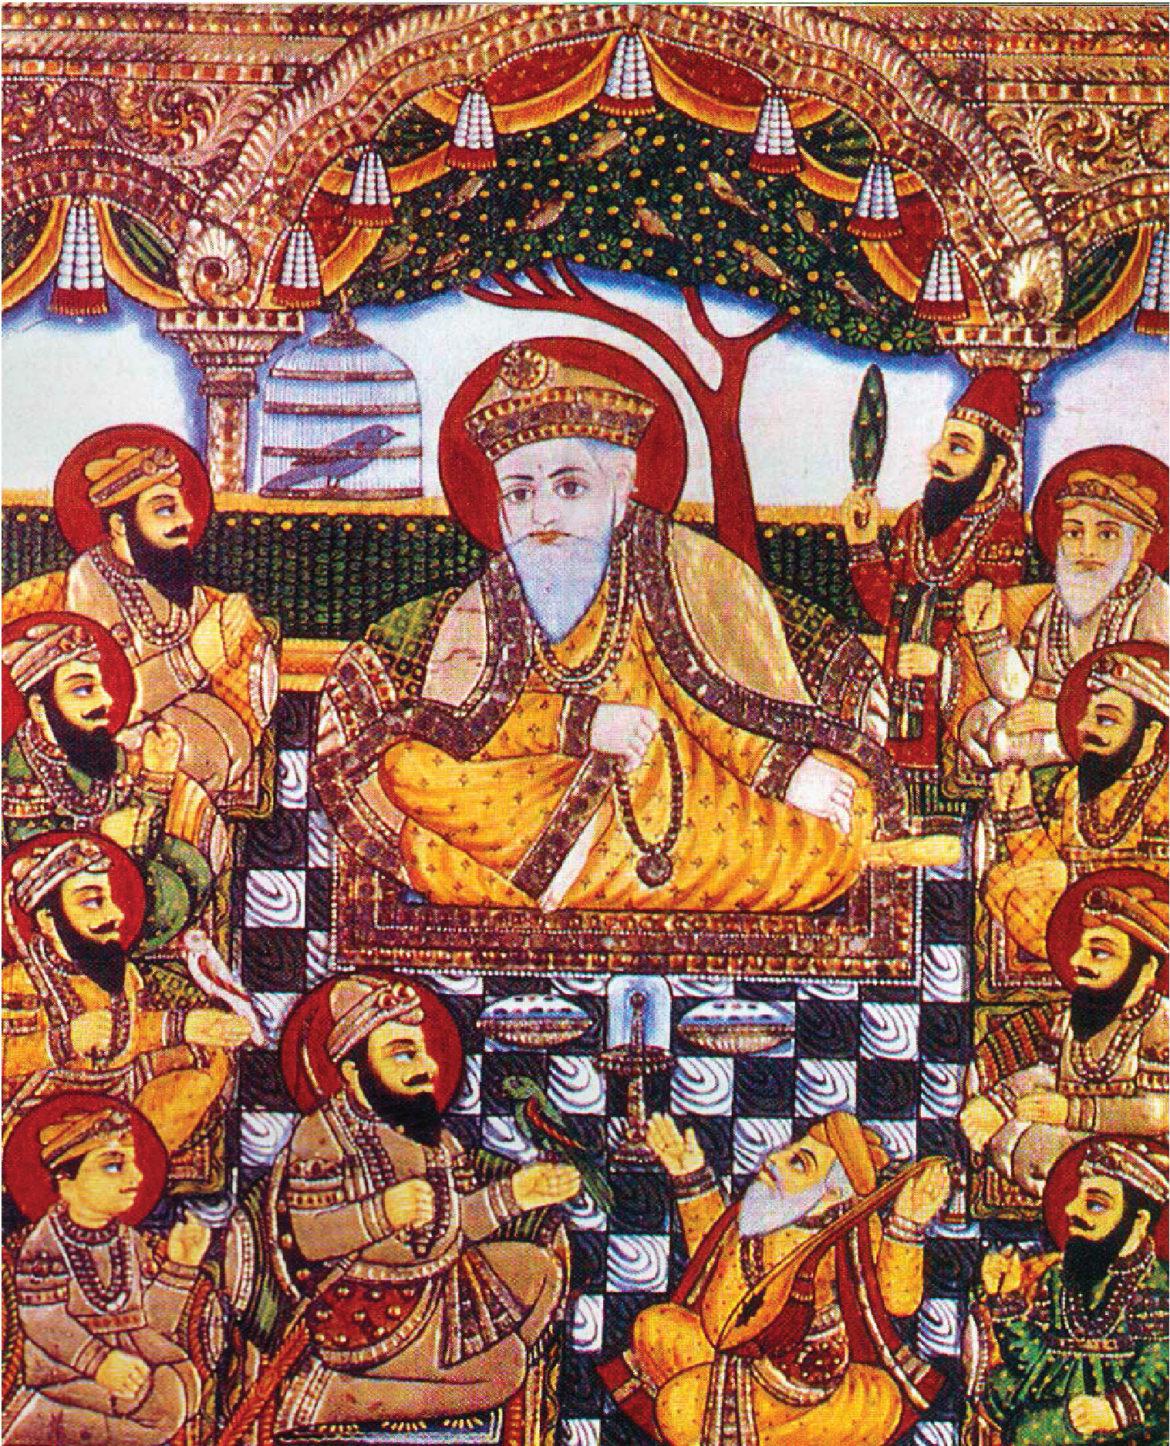 Life lessons from Guru Nanak Dev Ji